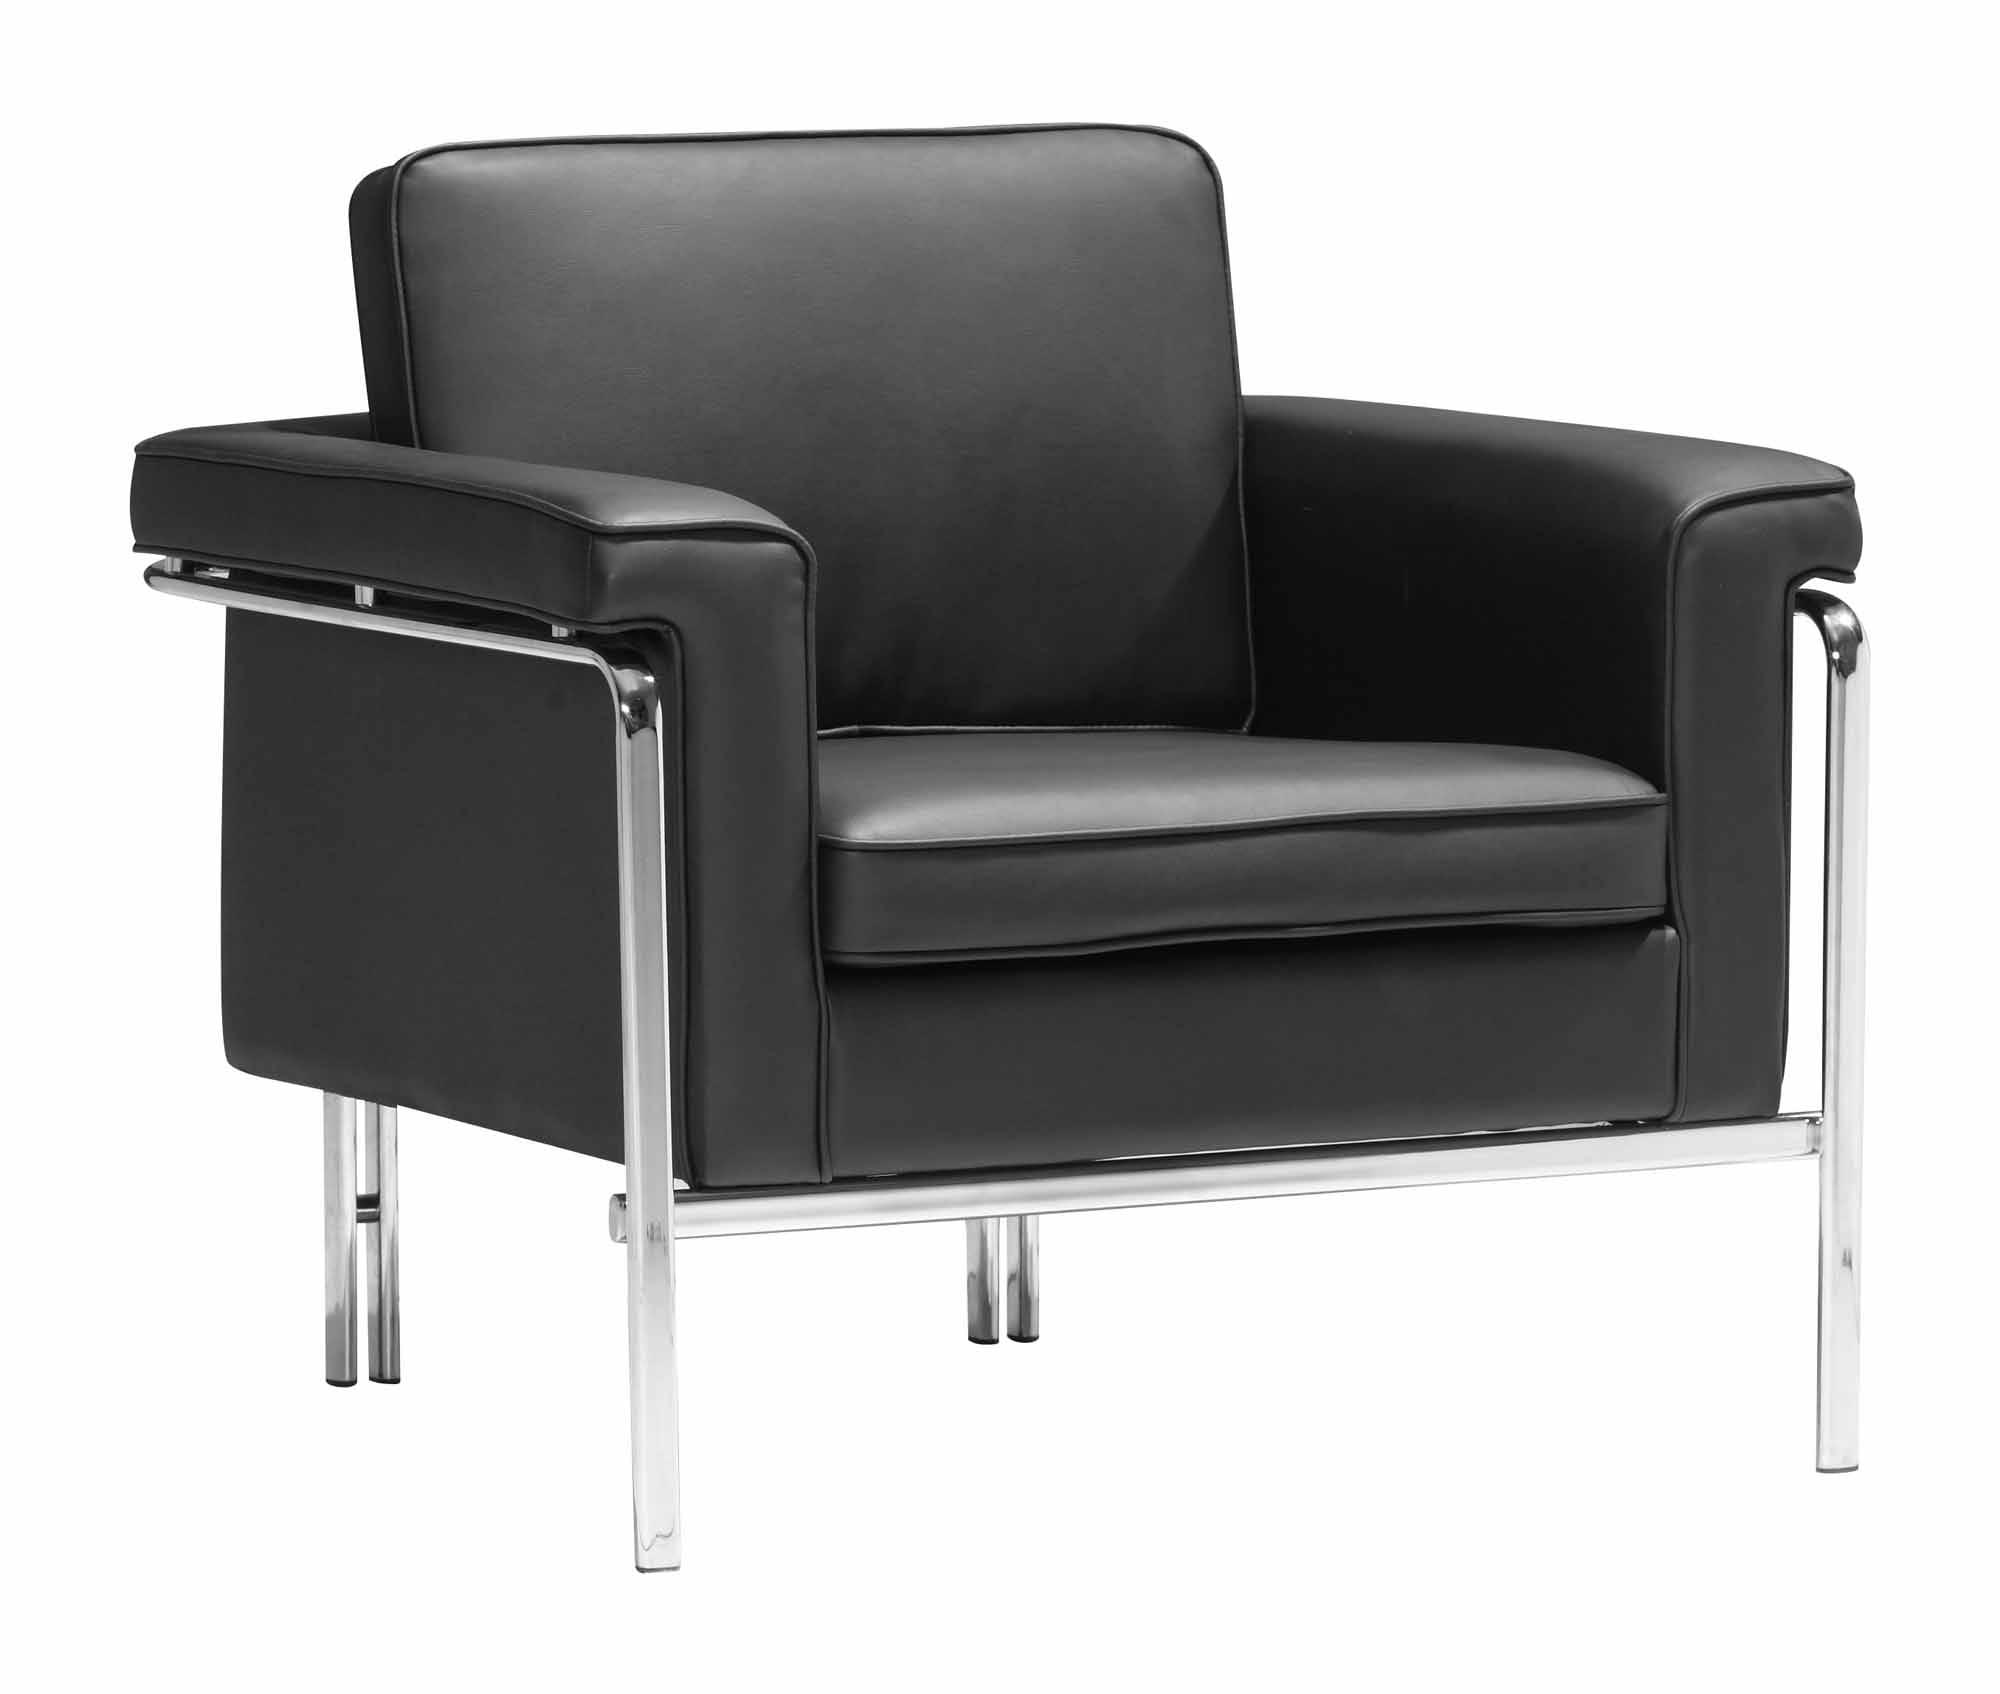 Singular Arm Chair Black by Zuo Modern